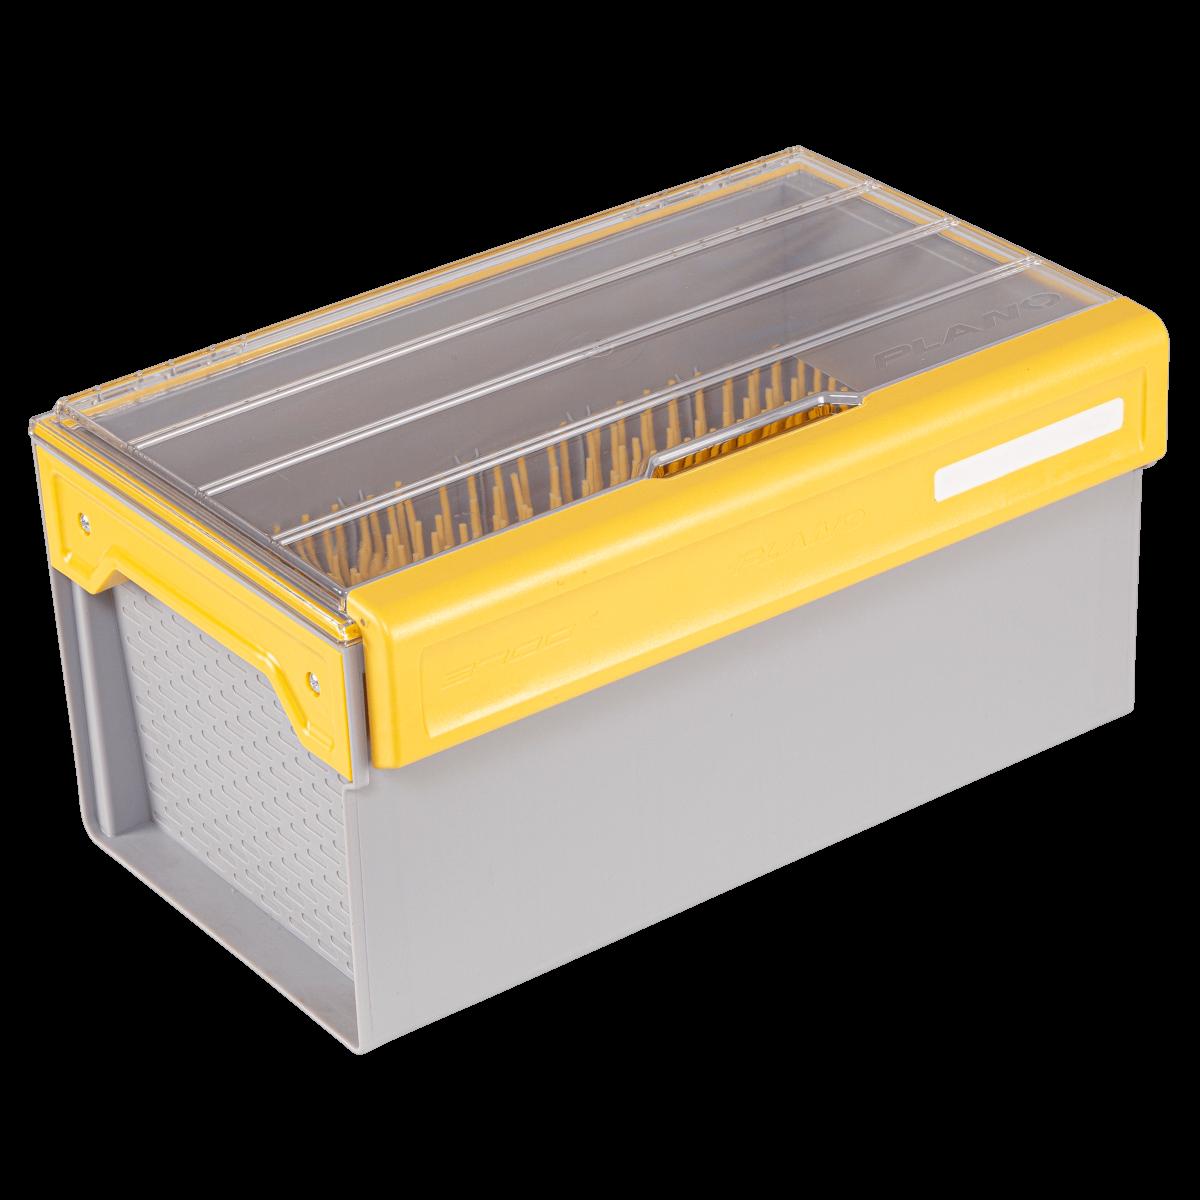 Plano Edge Crankbait XL Box